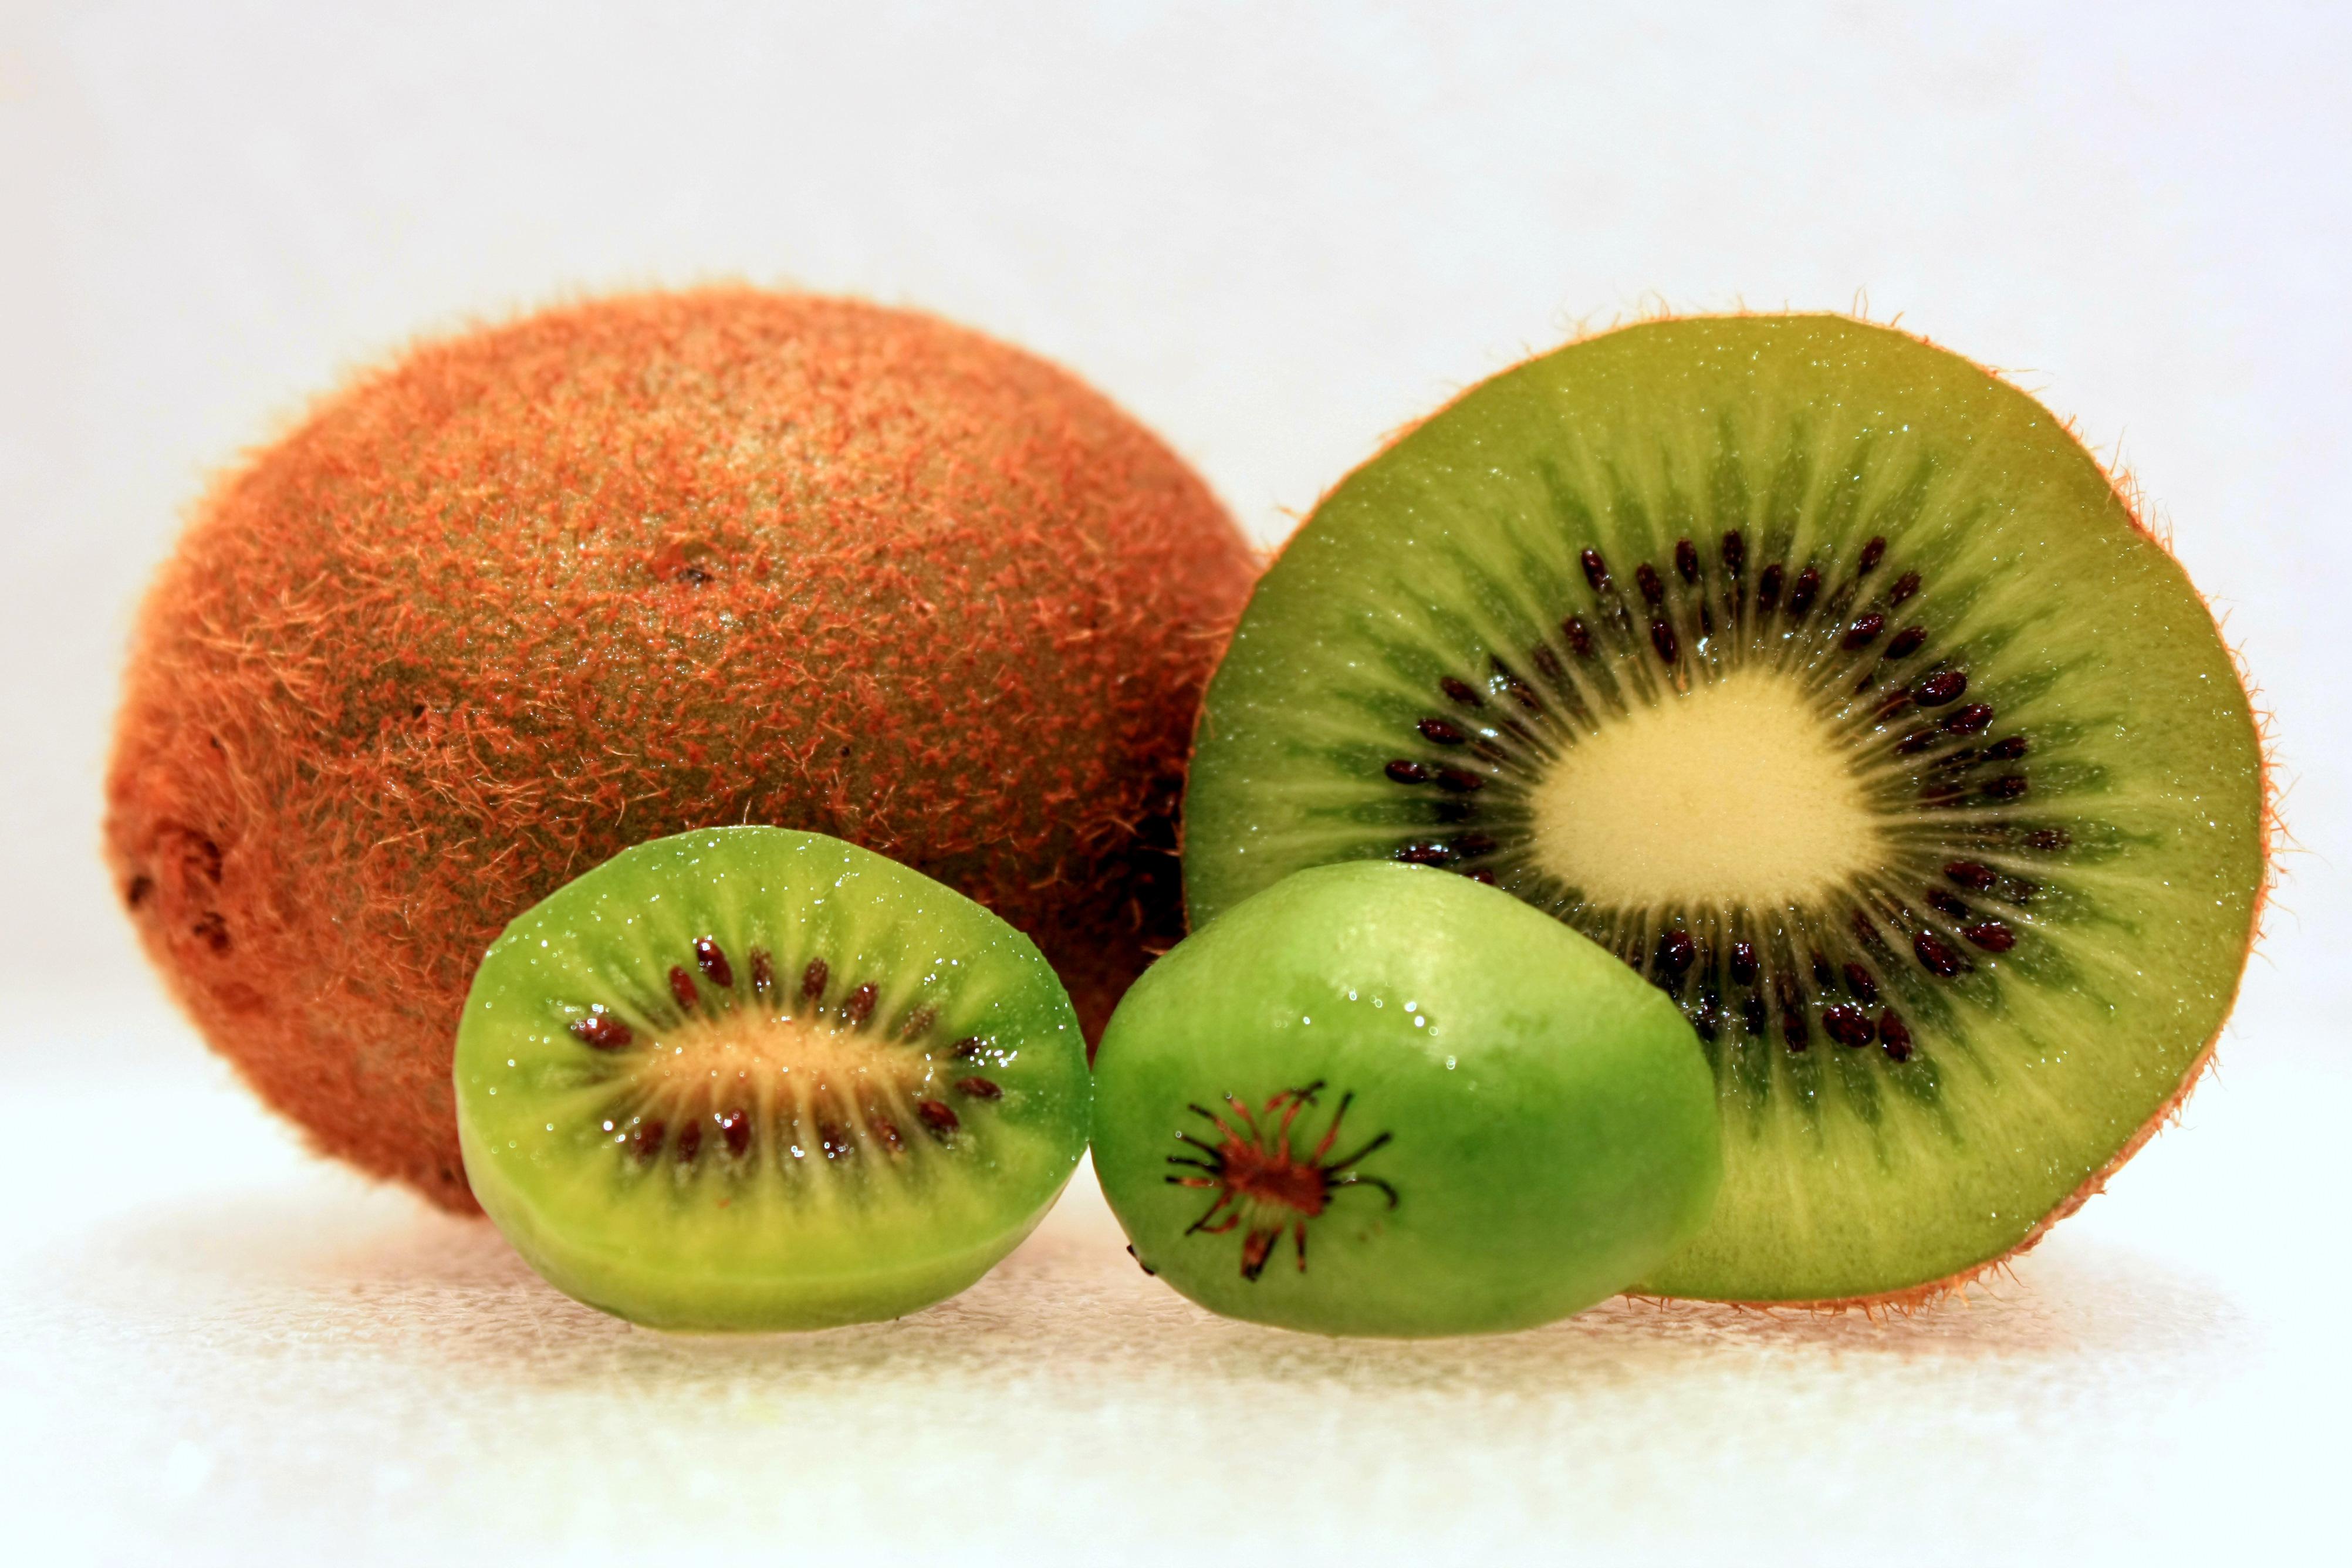 Hardy-Kiwi-Comparison-3